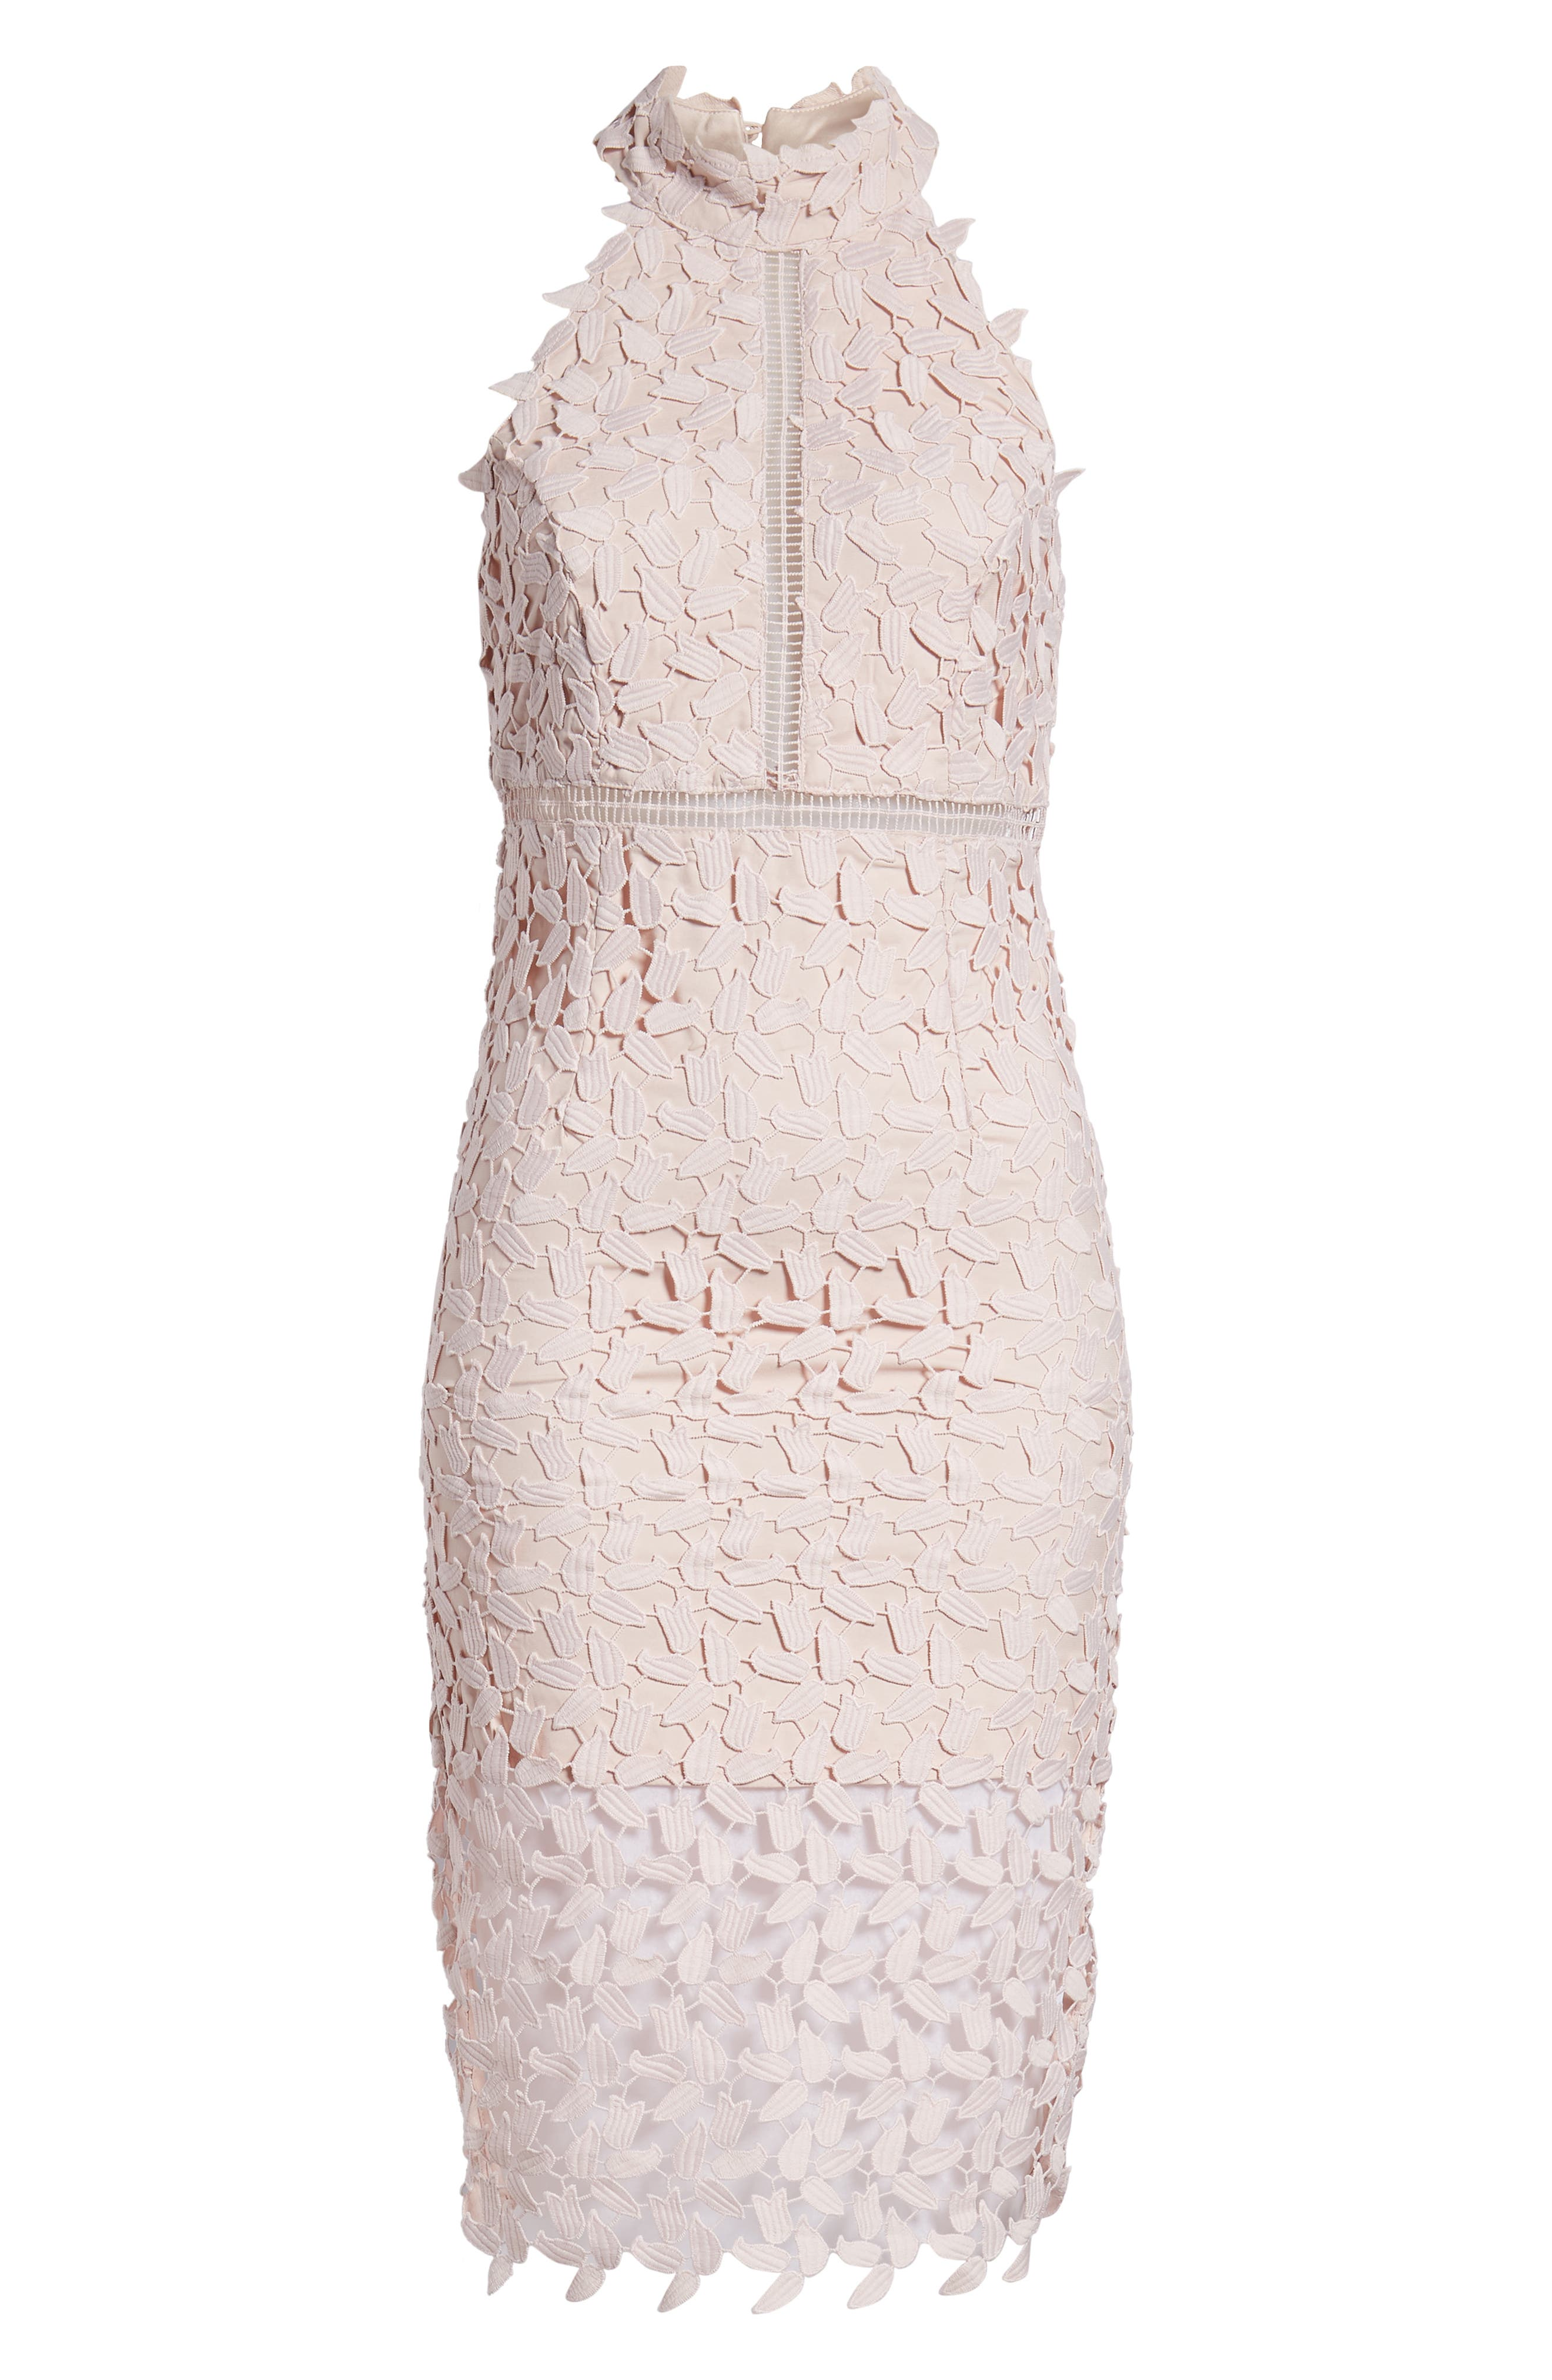 BARDOT, Gemma Halter Lace Sheath Dress, Alternate thumbnail 7, color, PROSECCO